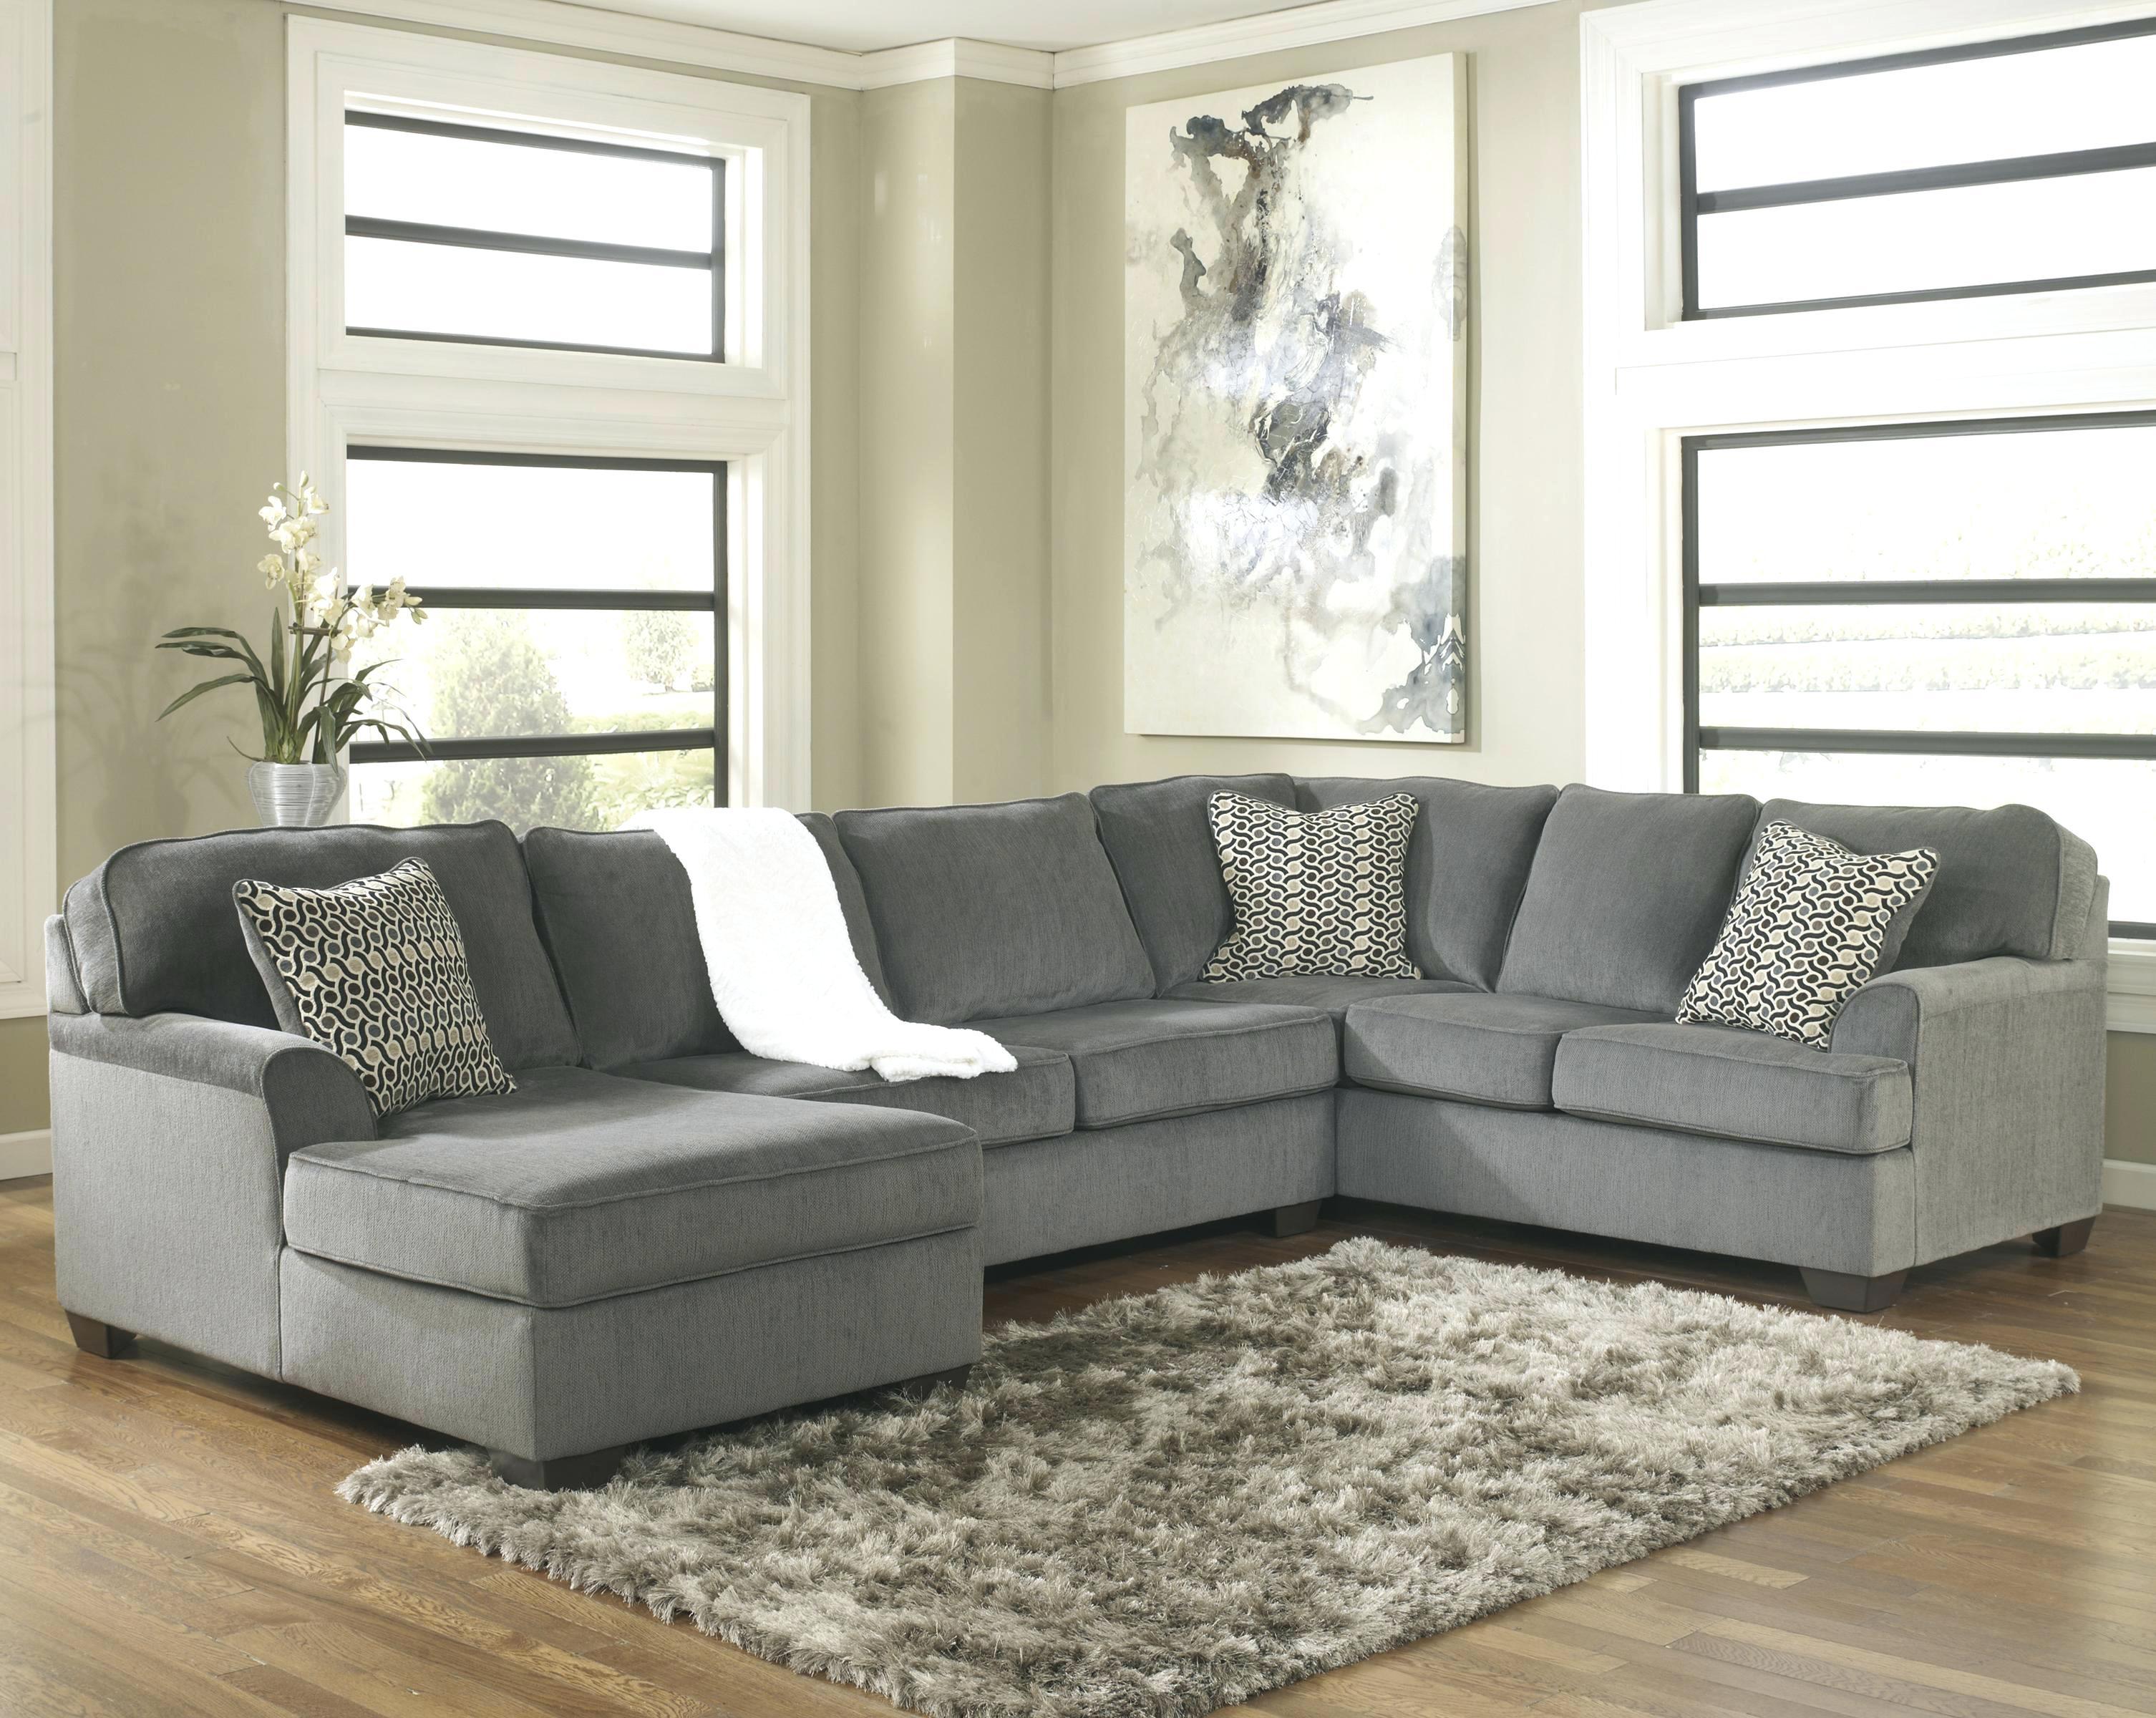 Ashley Furniture Tuscaloosa – Premiojer (Image 1 of 10)